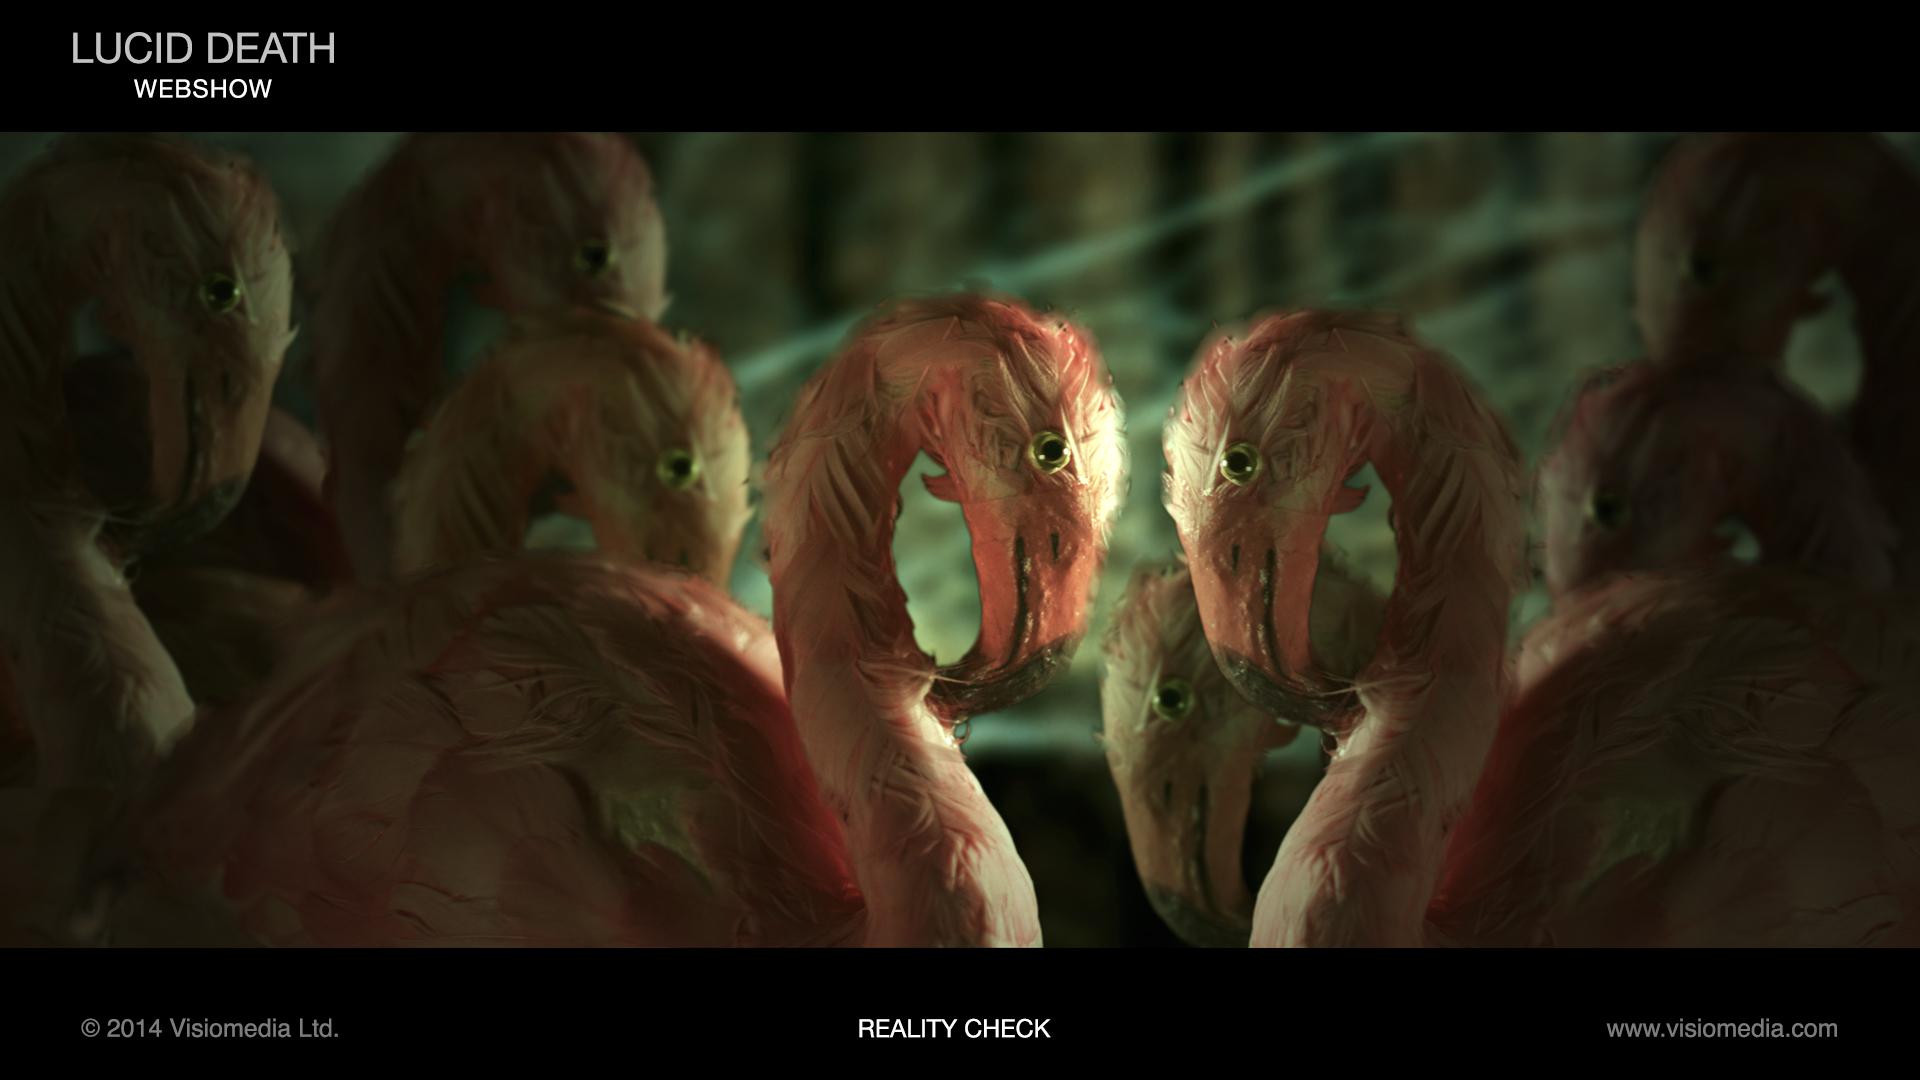 reality_check_flamingos_1920x1080